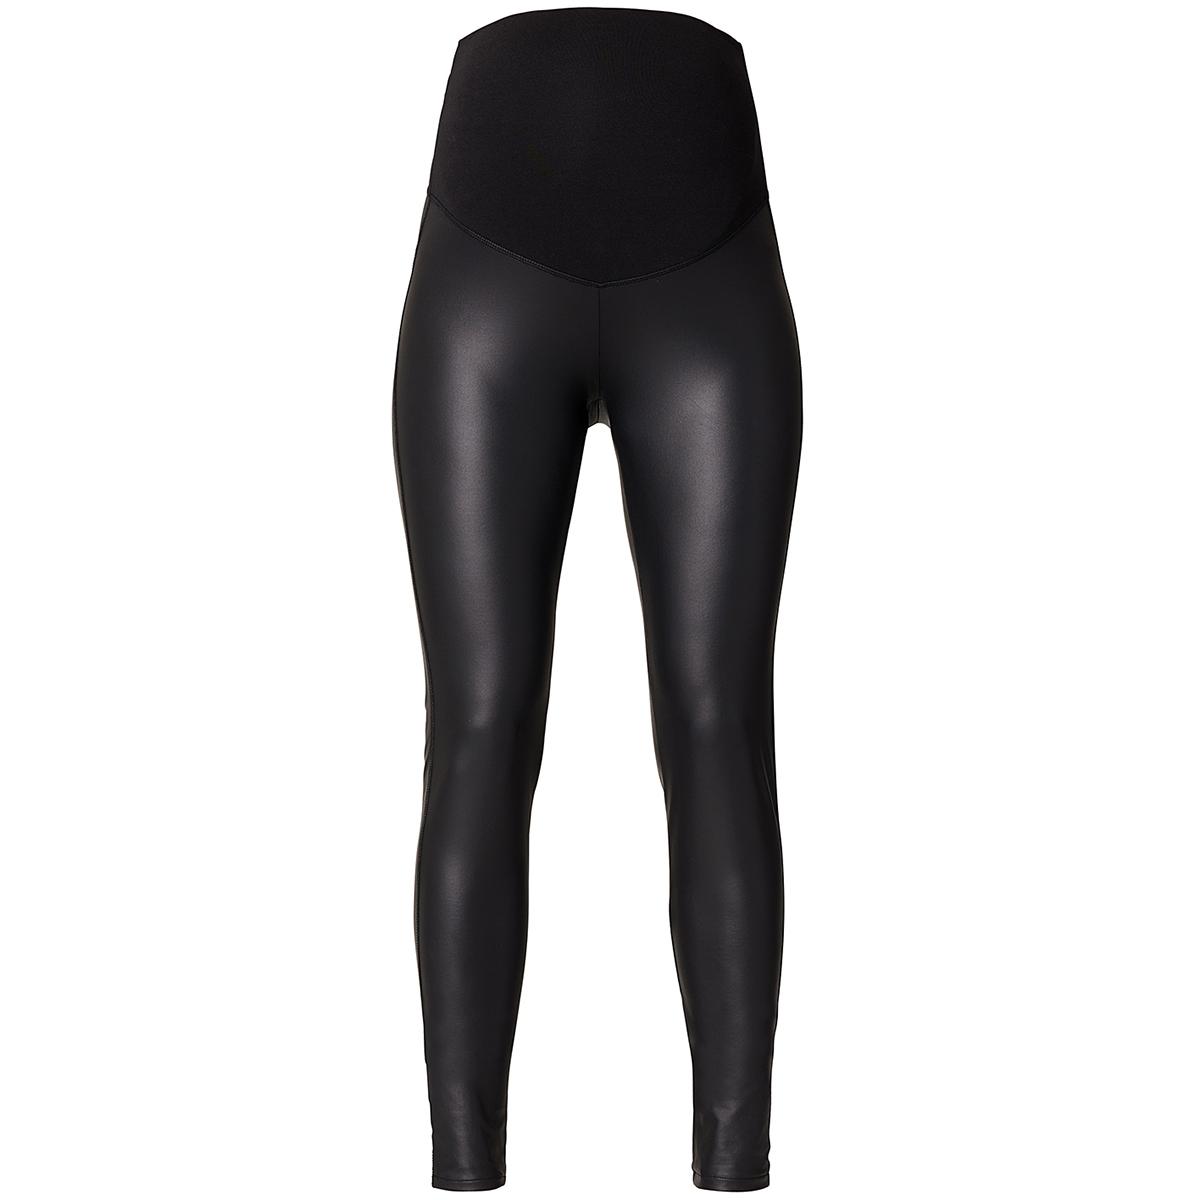 s0669 legging shine supermom positie broek black